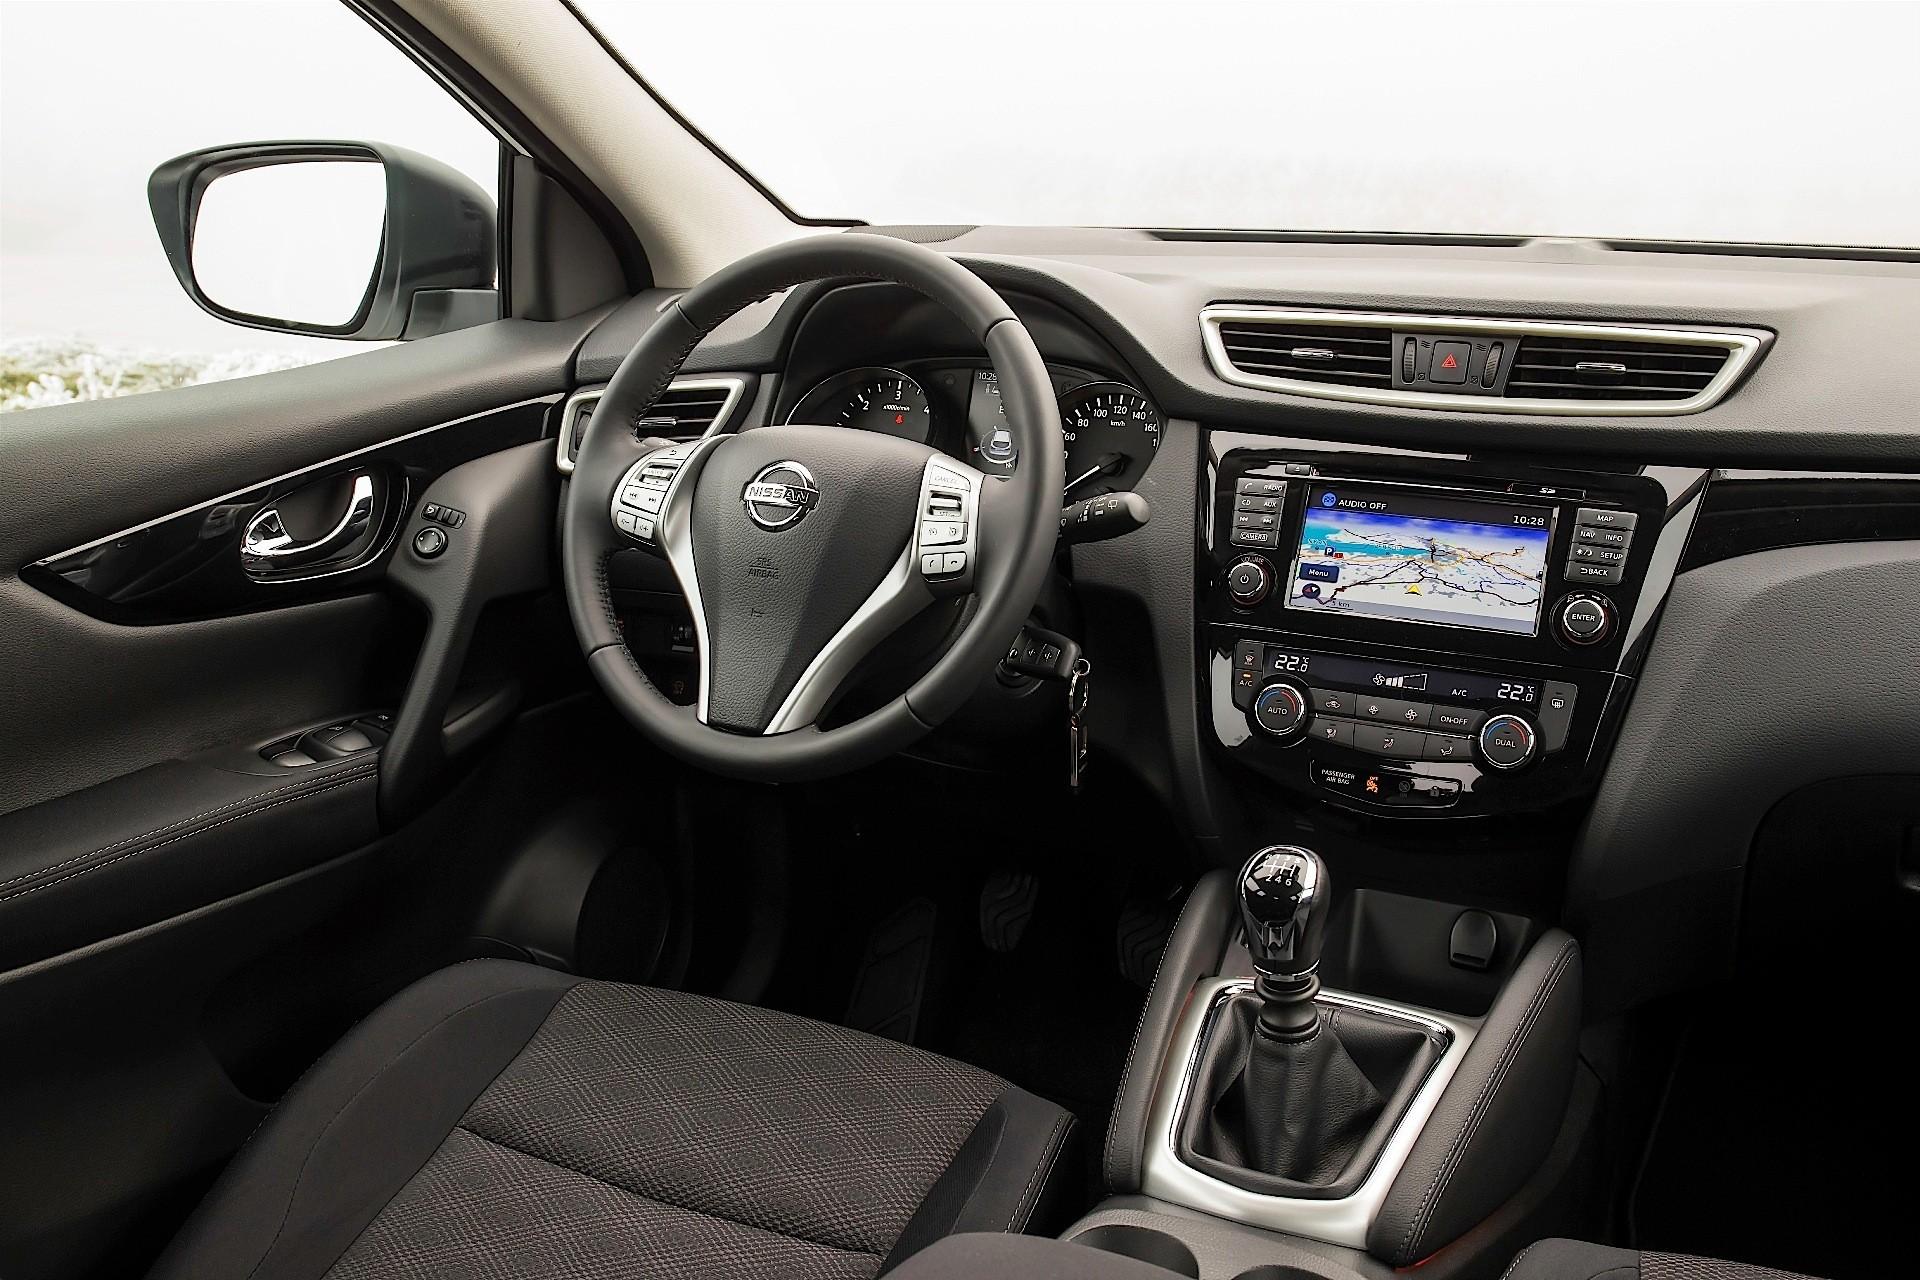 Us spec nissan qashqai will debut at 2017 detroit auto autoevolution for Interieur 2016